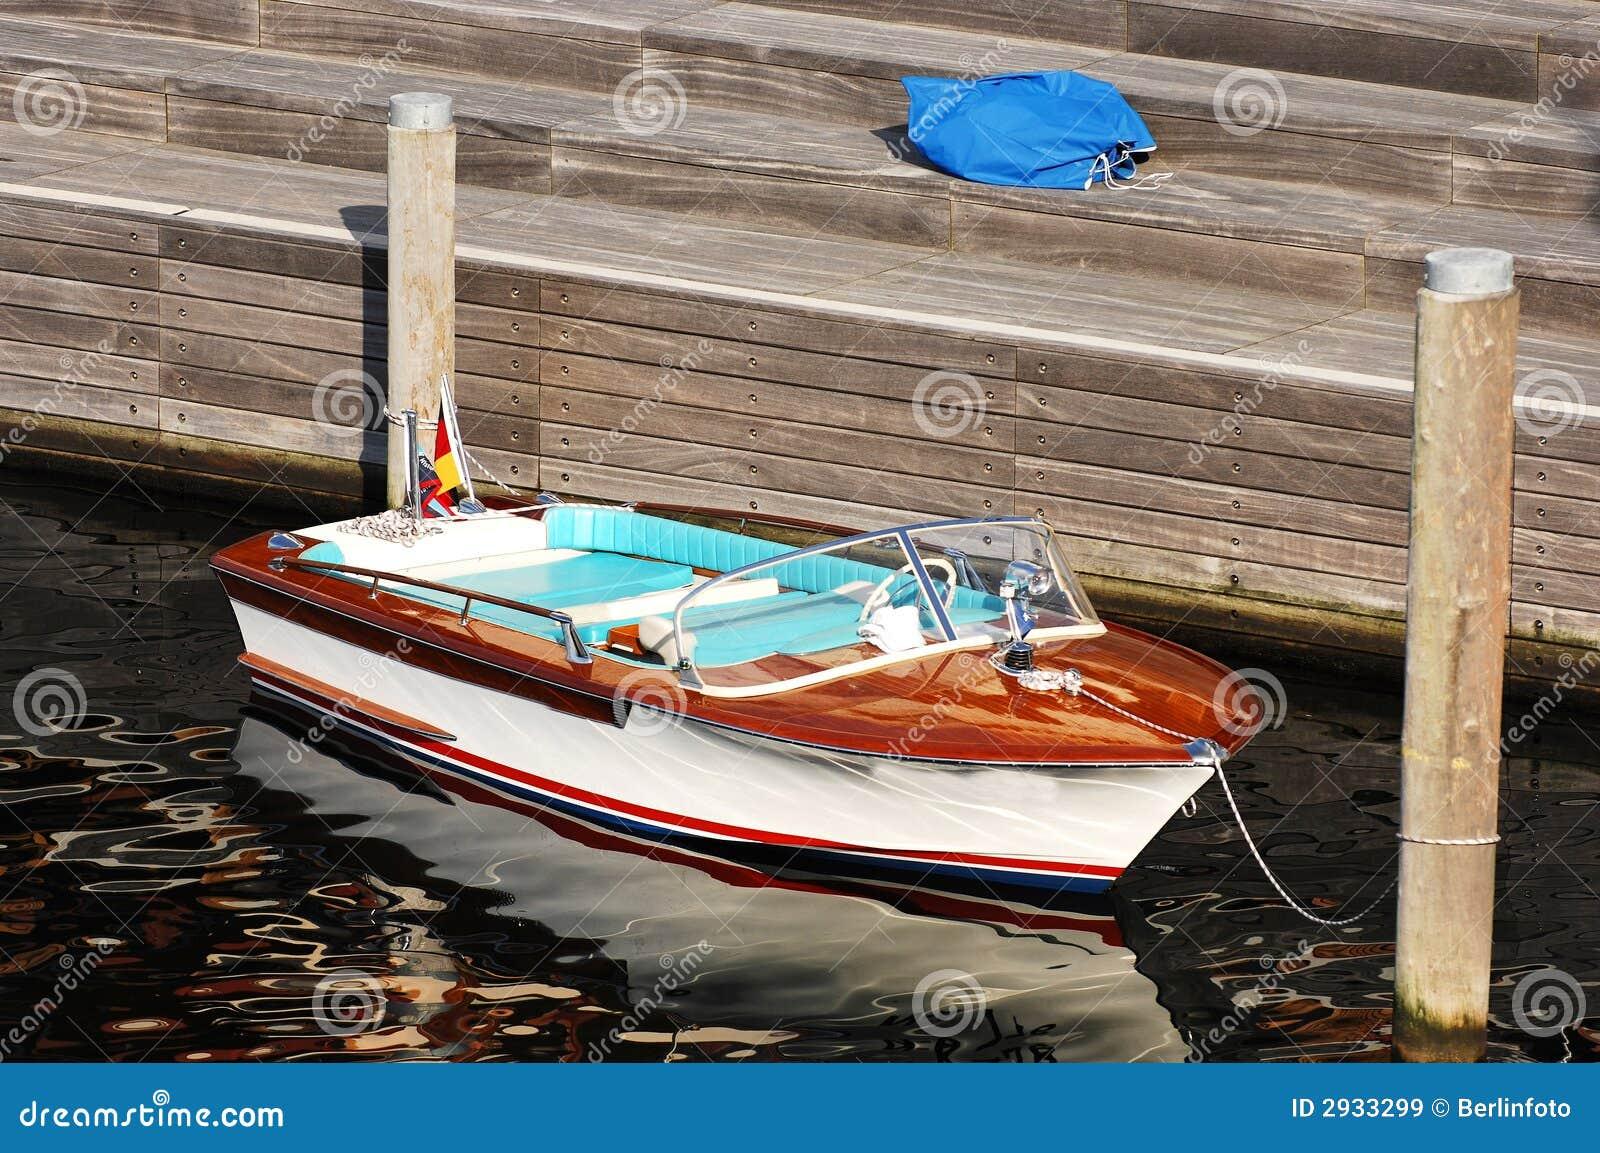 Free diy bait boat plans